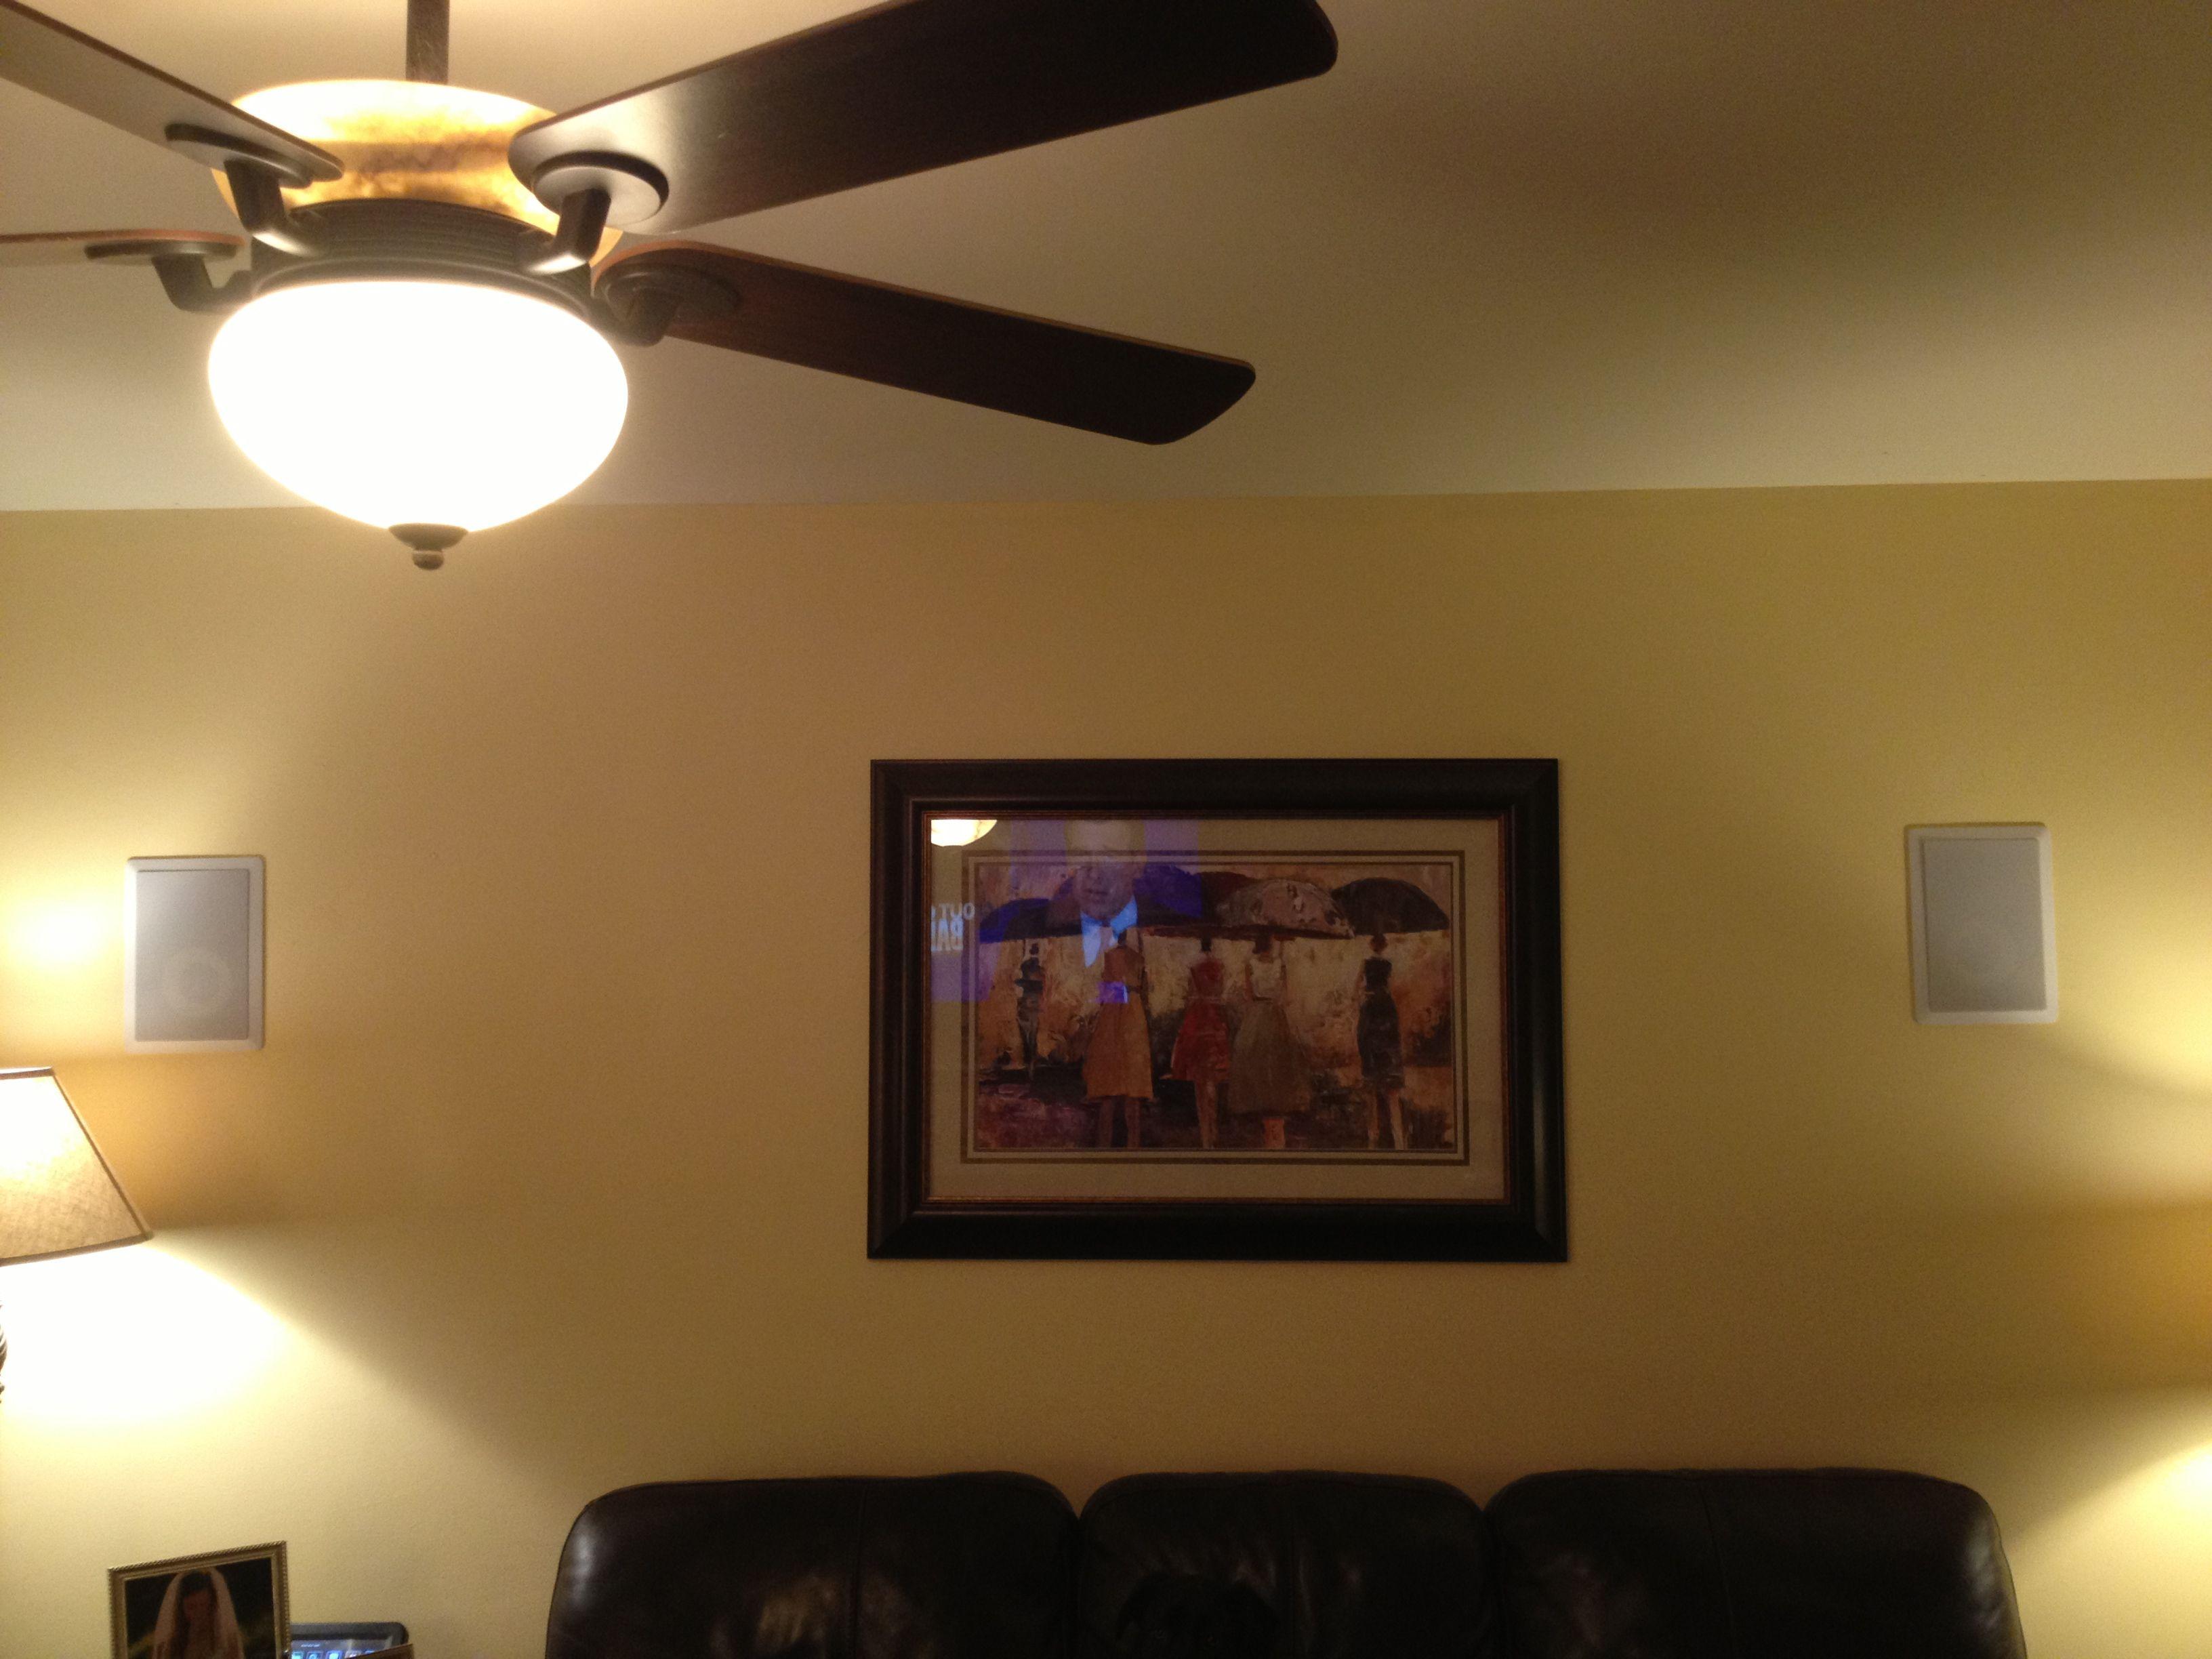 Wall lights, Surround sound